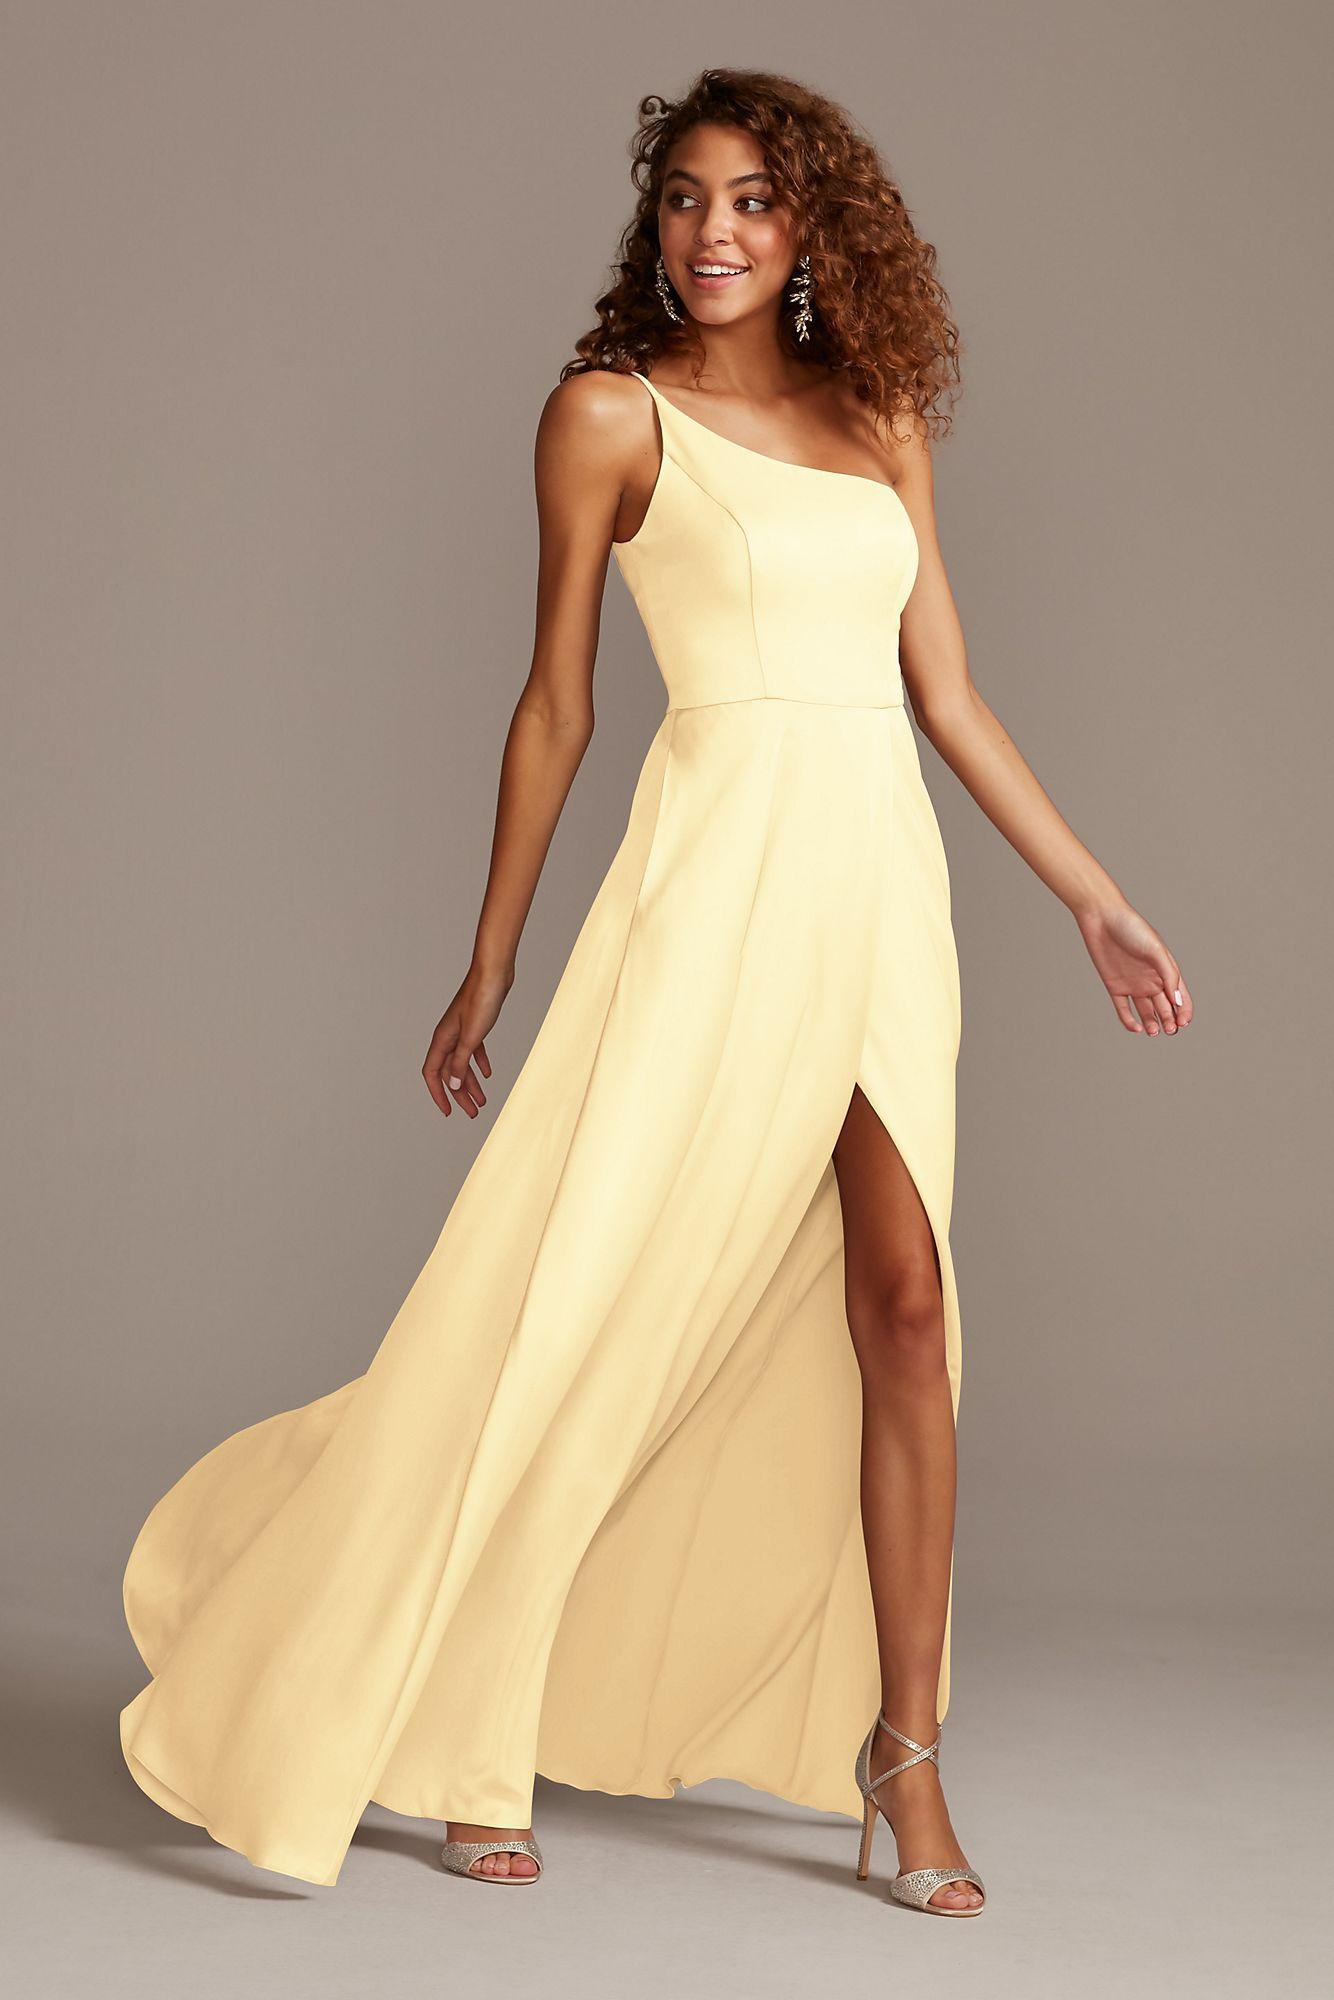 Satin One-Shoulder Bridesmaid Dress